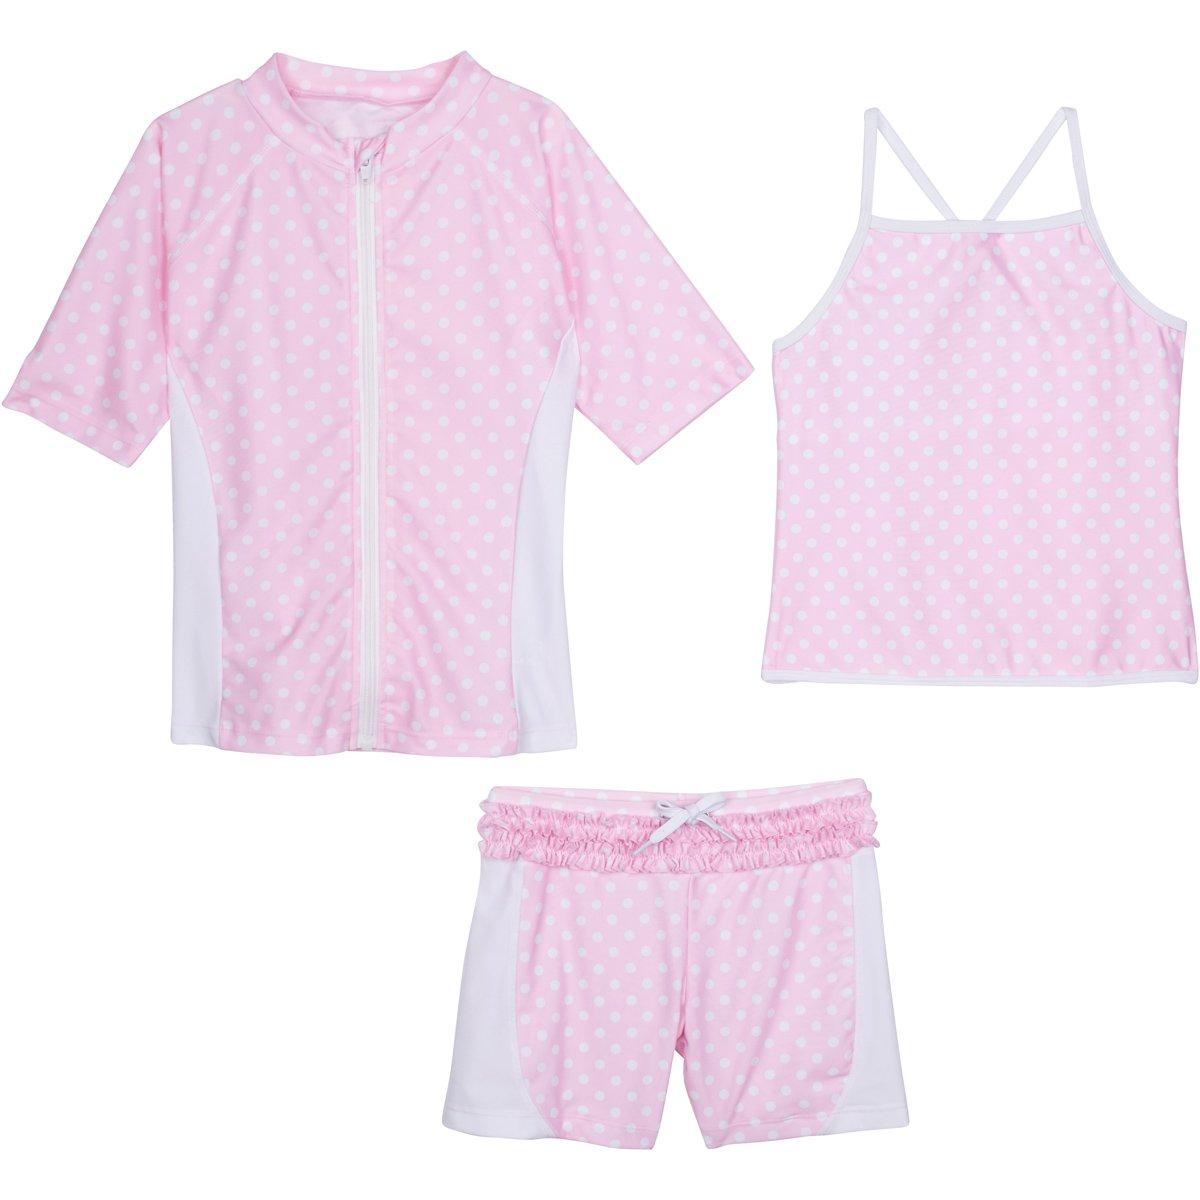 SwimZip Girls Short Sleeve Rash Guard Swim Shorts Set UPF 50+ Sun Protective Zipper Pink 4T SZISSSHORTSET3PC26